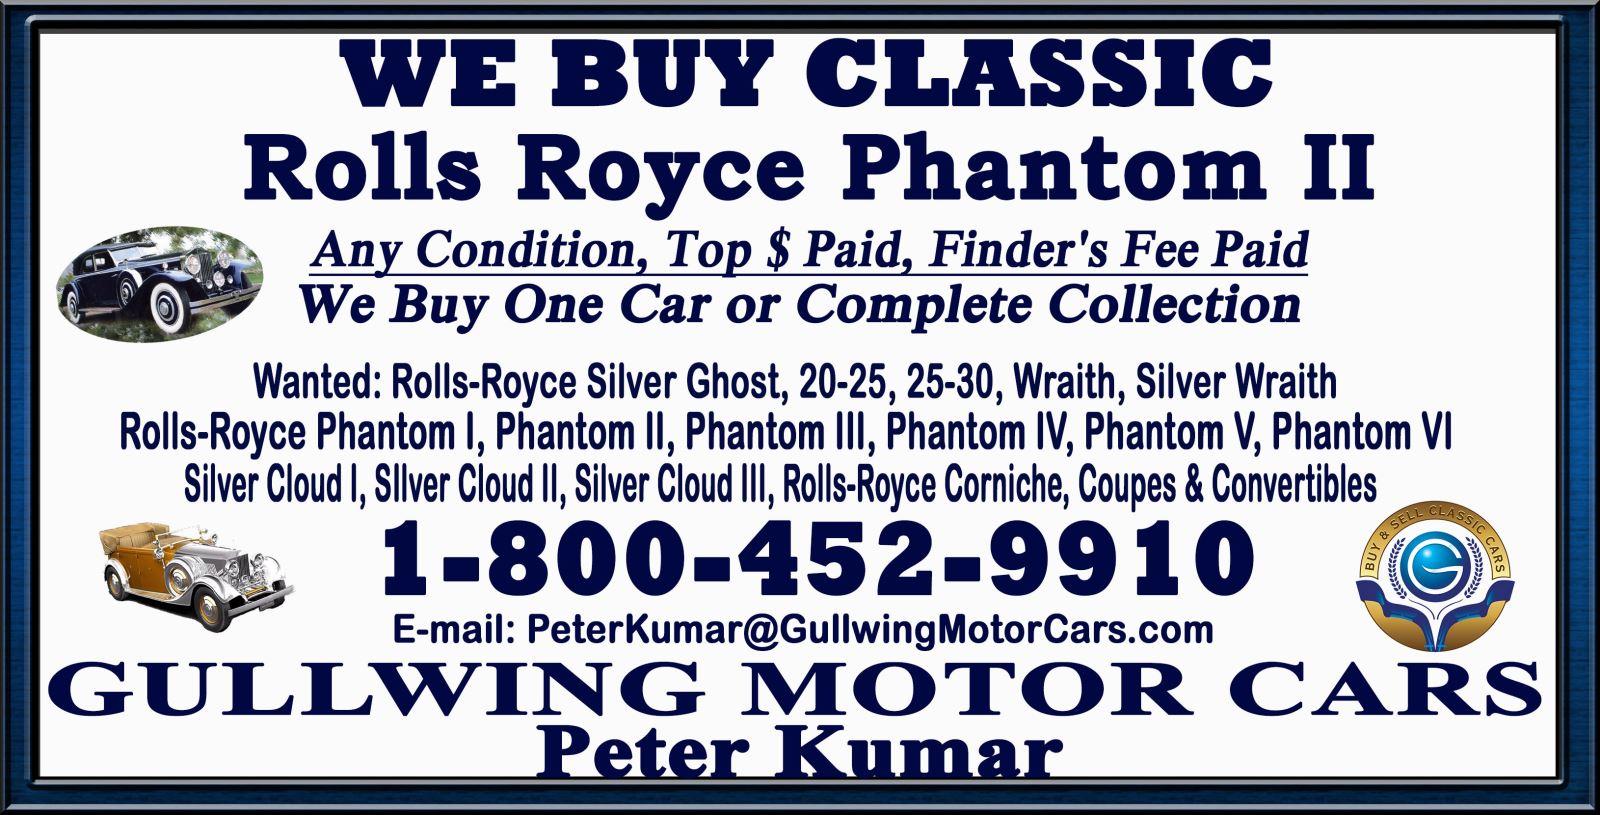 Sell Classic Rolls Royce Silver Cloud III | Call Gullwing Motor if Vintage Rolls Royce Silver Cloud III For Sale